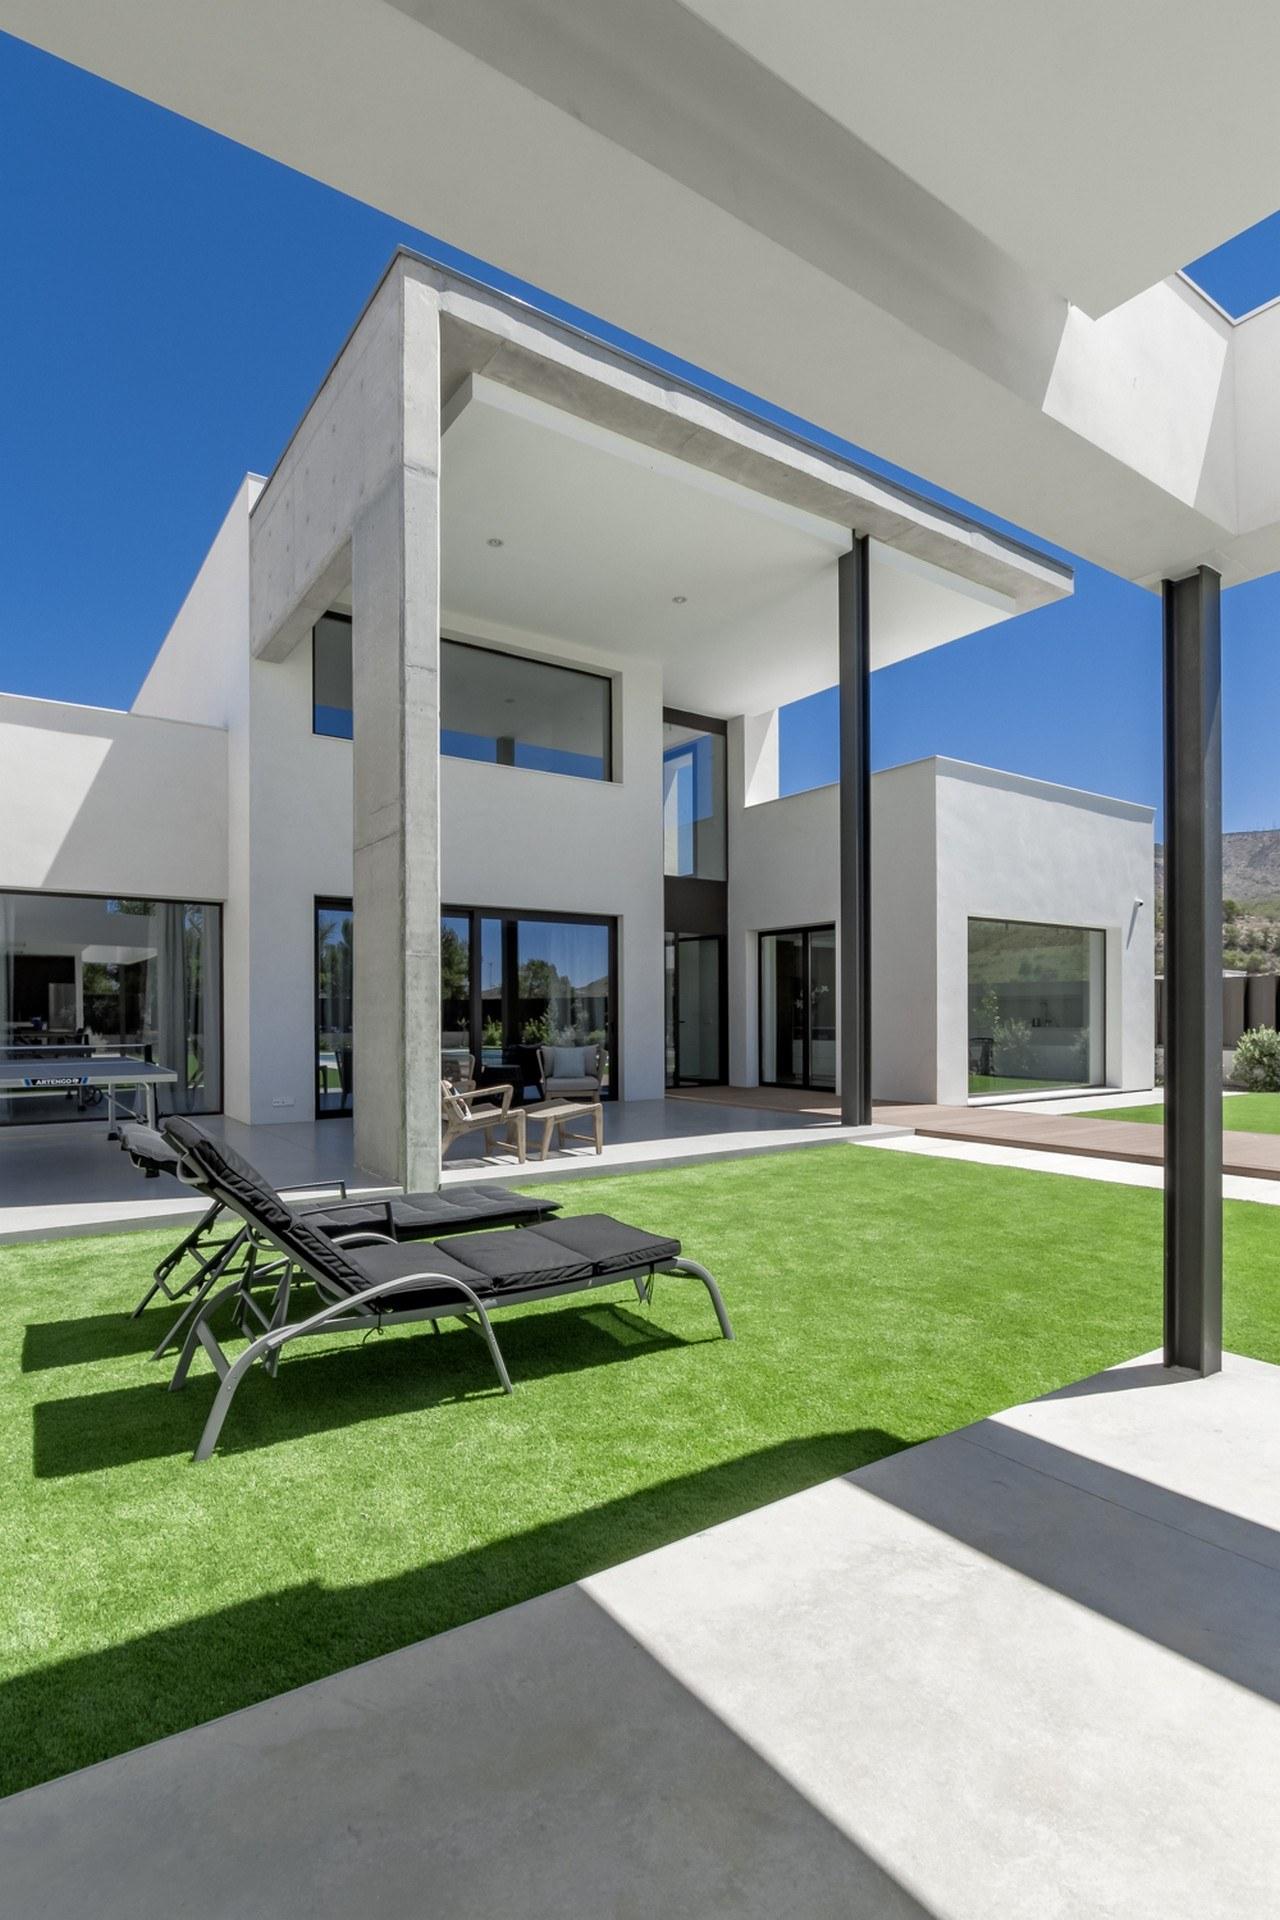 Microcemento para exteriores revestimientos de exterior - Microcemento para exterior ...